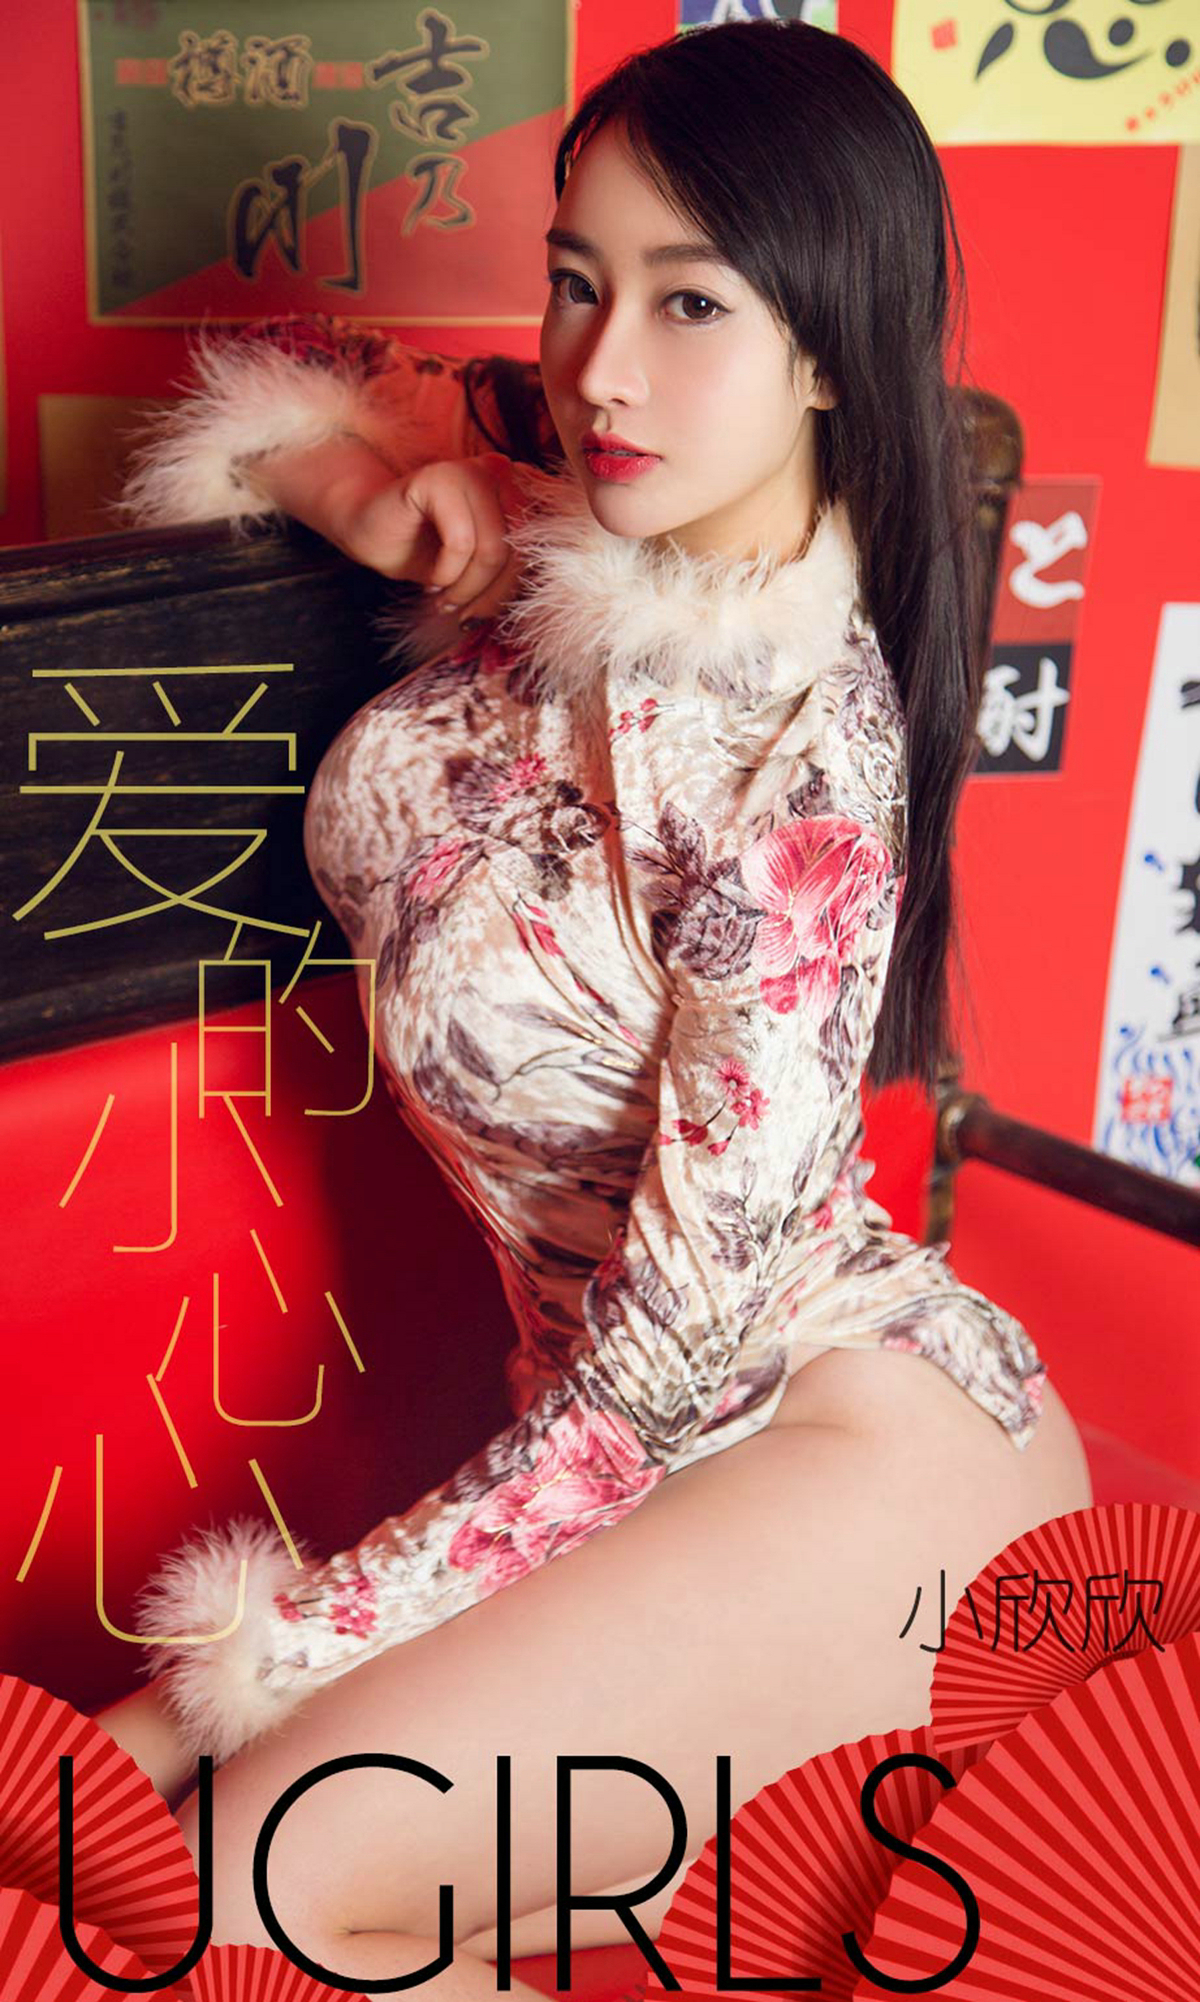 [Ugirls]爱尤物 No.1358 爱的小心心 小欣欣